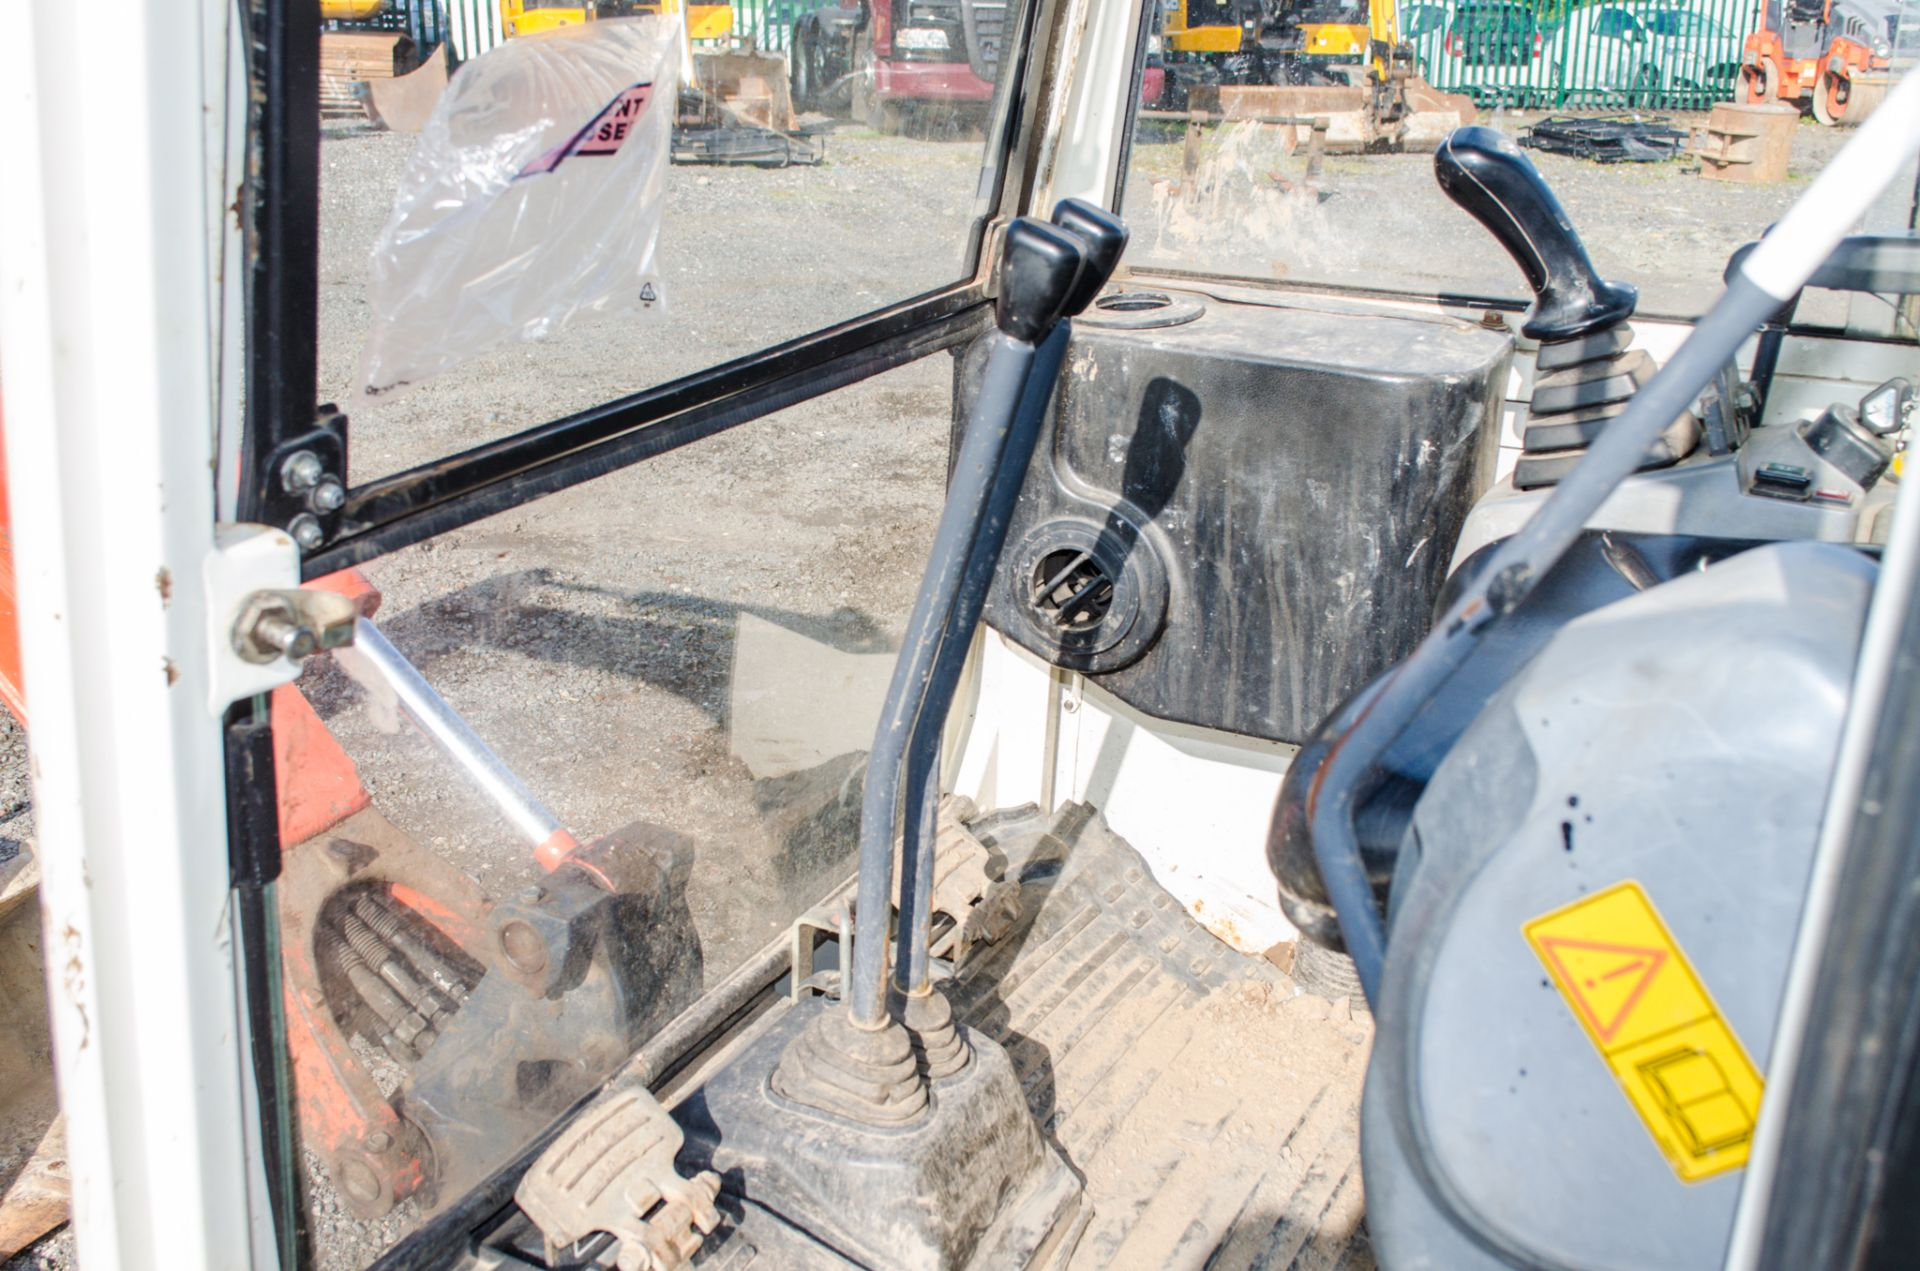 Kubota KX36-3 1.5 tonne rubber tracked mini excavator Year: 2007 S/N: Z077298 Recorded Hours: 4205 - Image 16 of 18